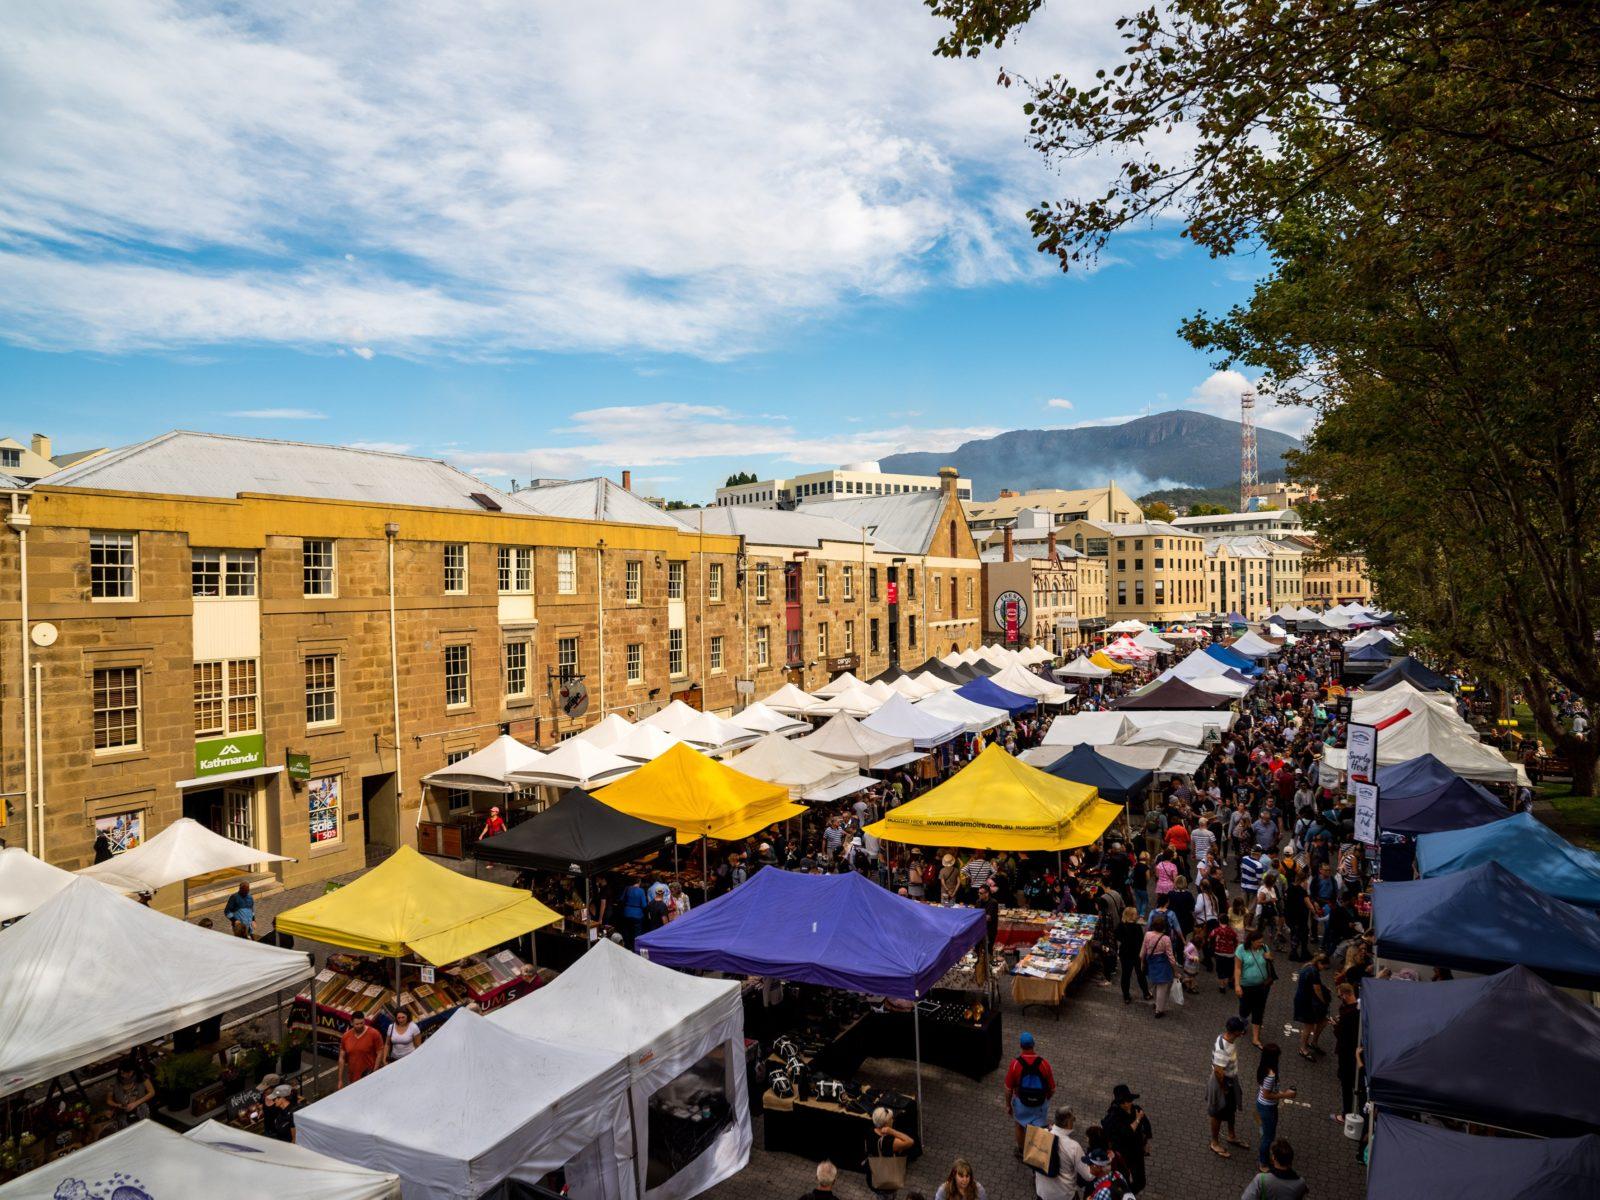 Explore over 300 stalls every Saturday